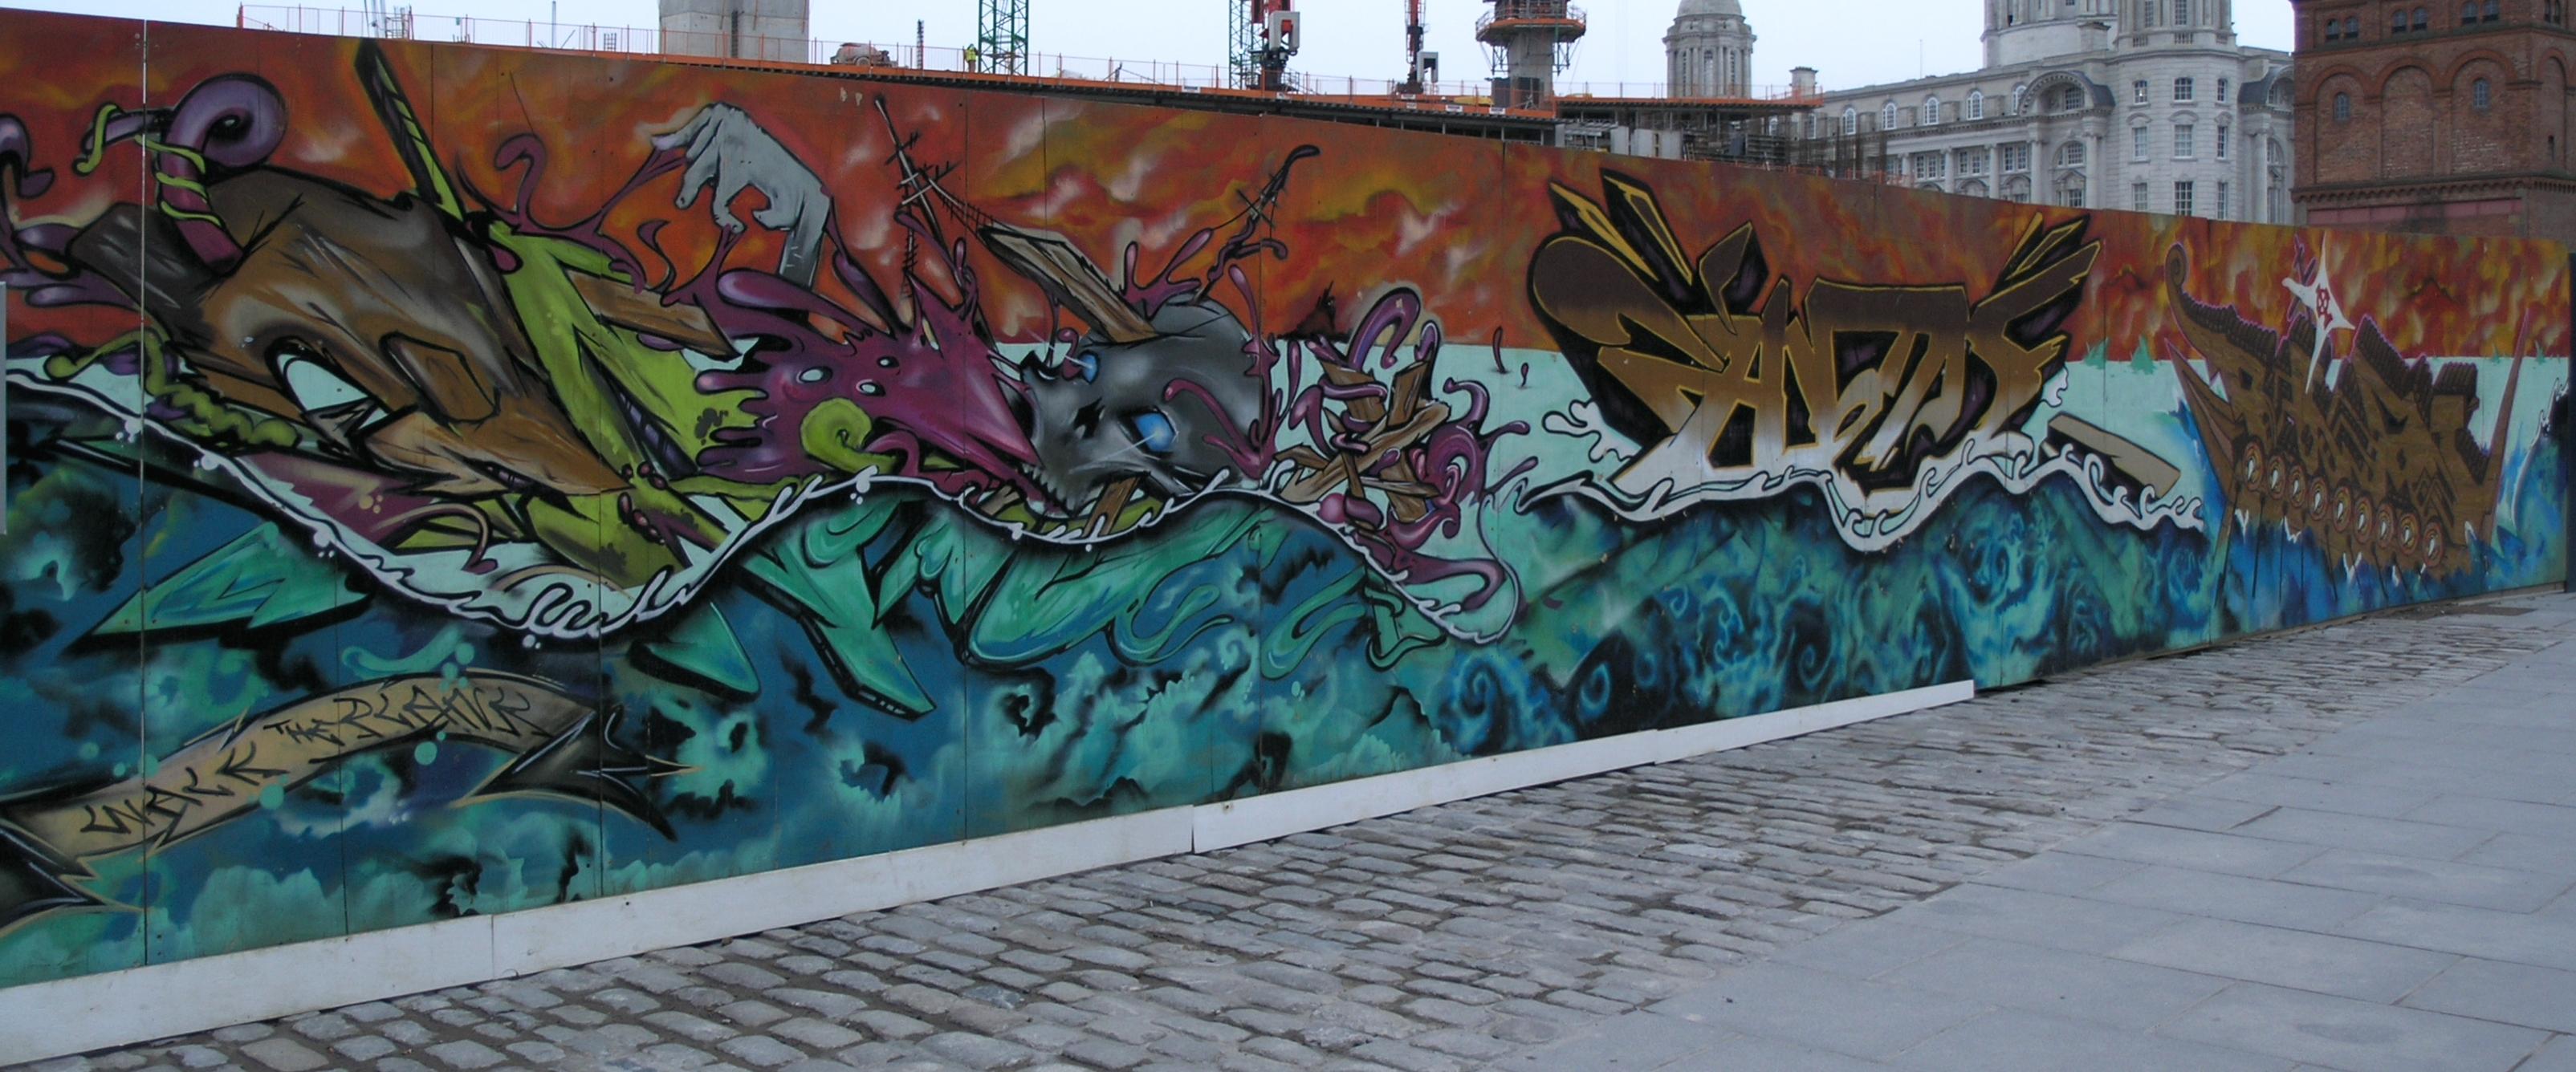 Street art in Liverpool